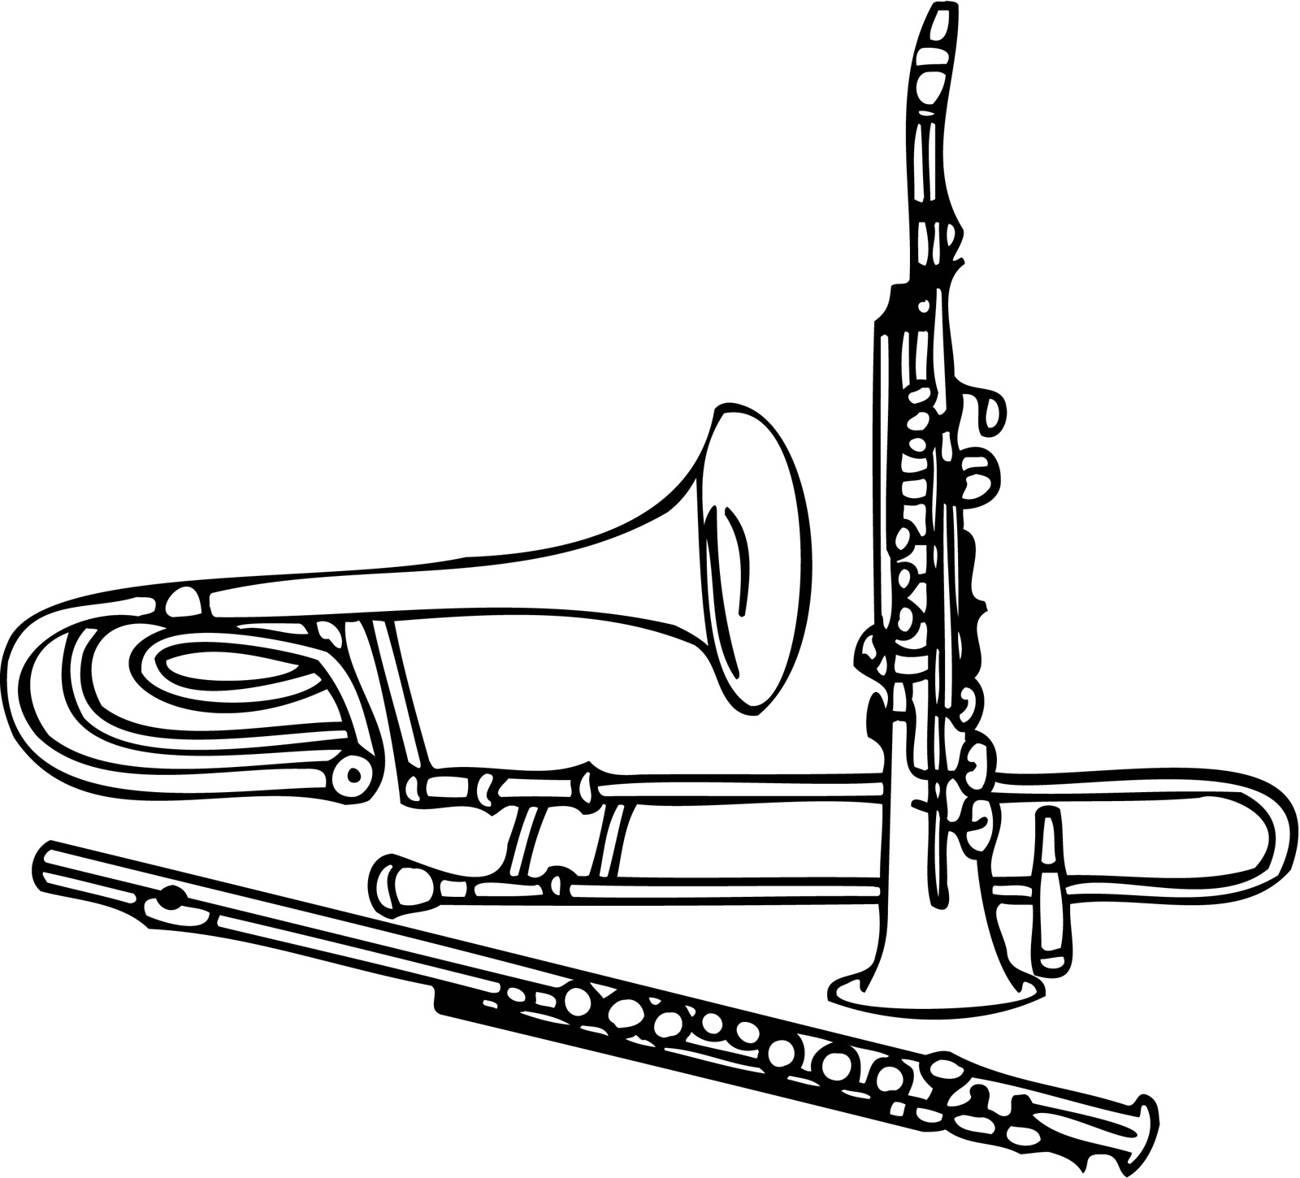 MUSIC-062